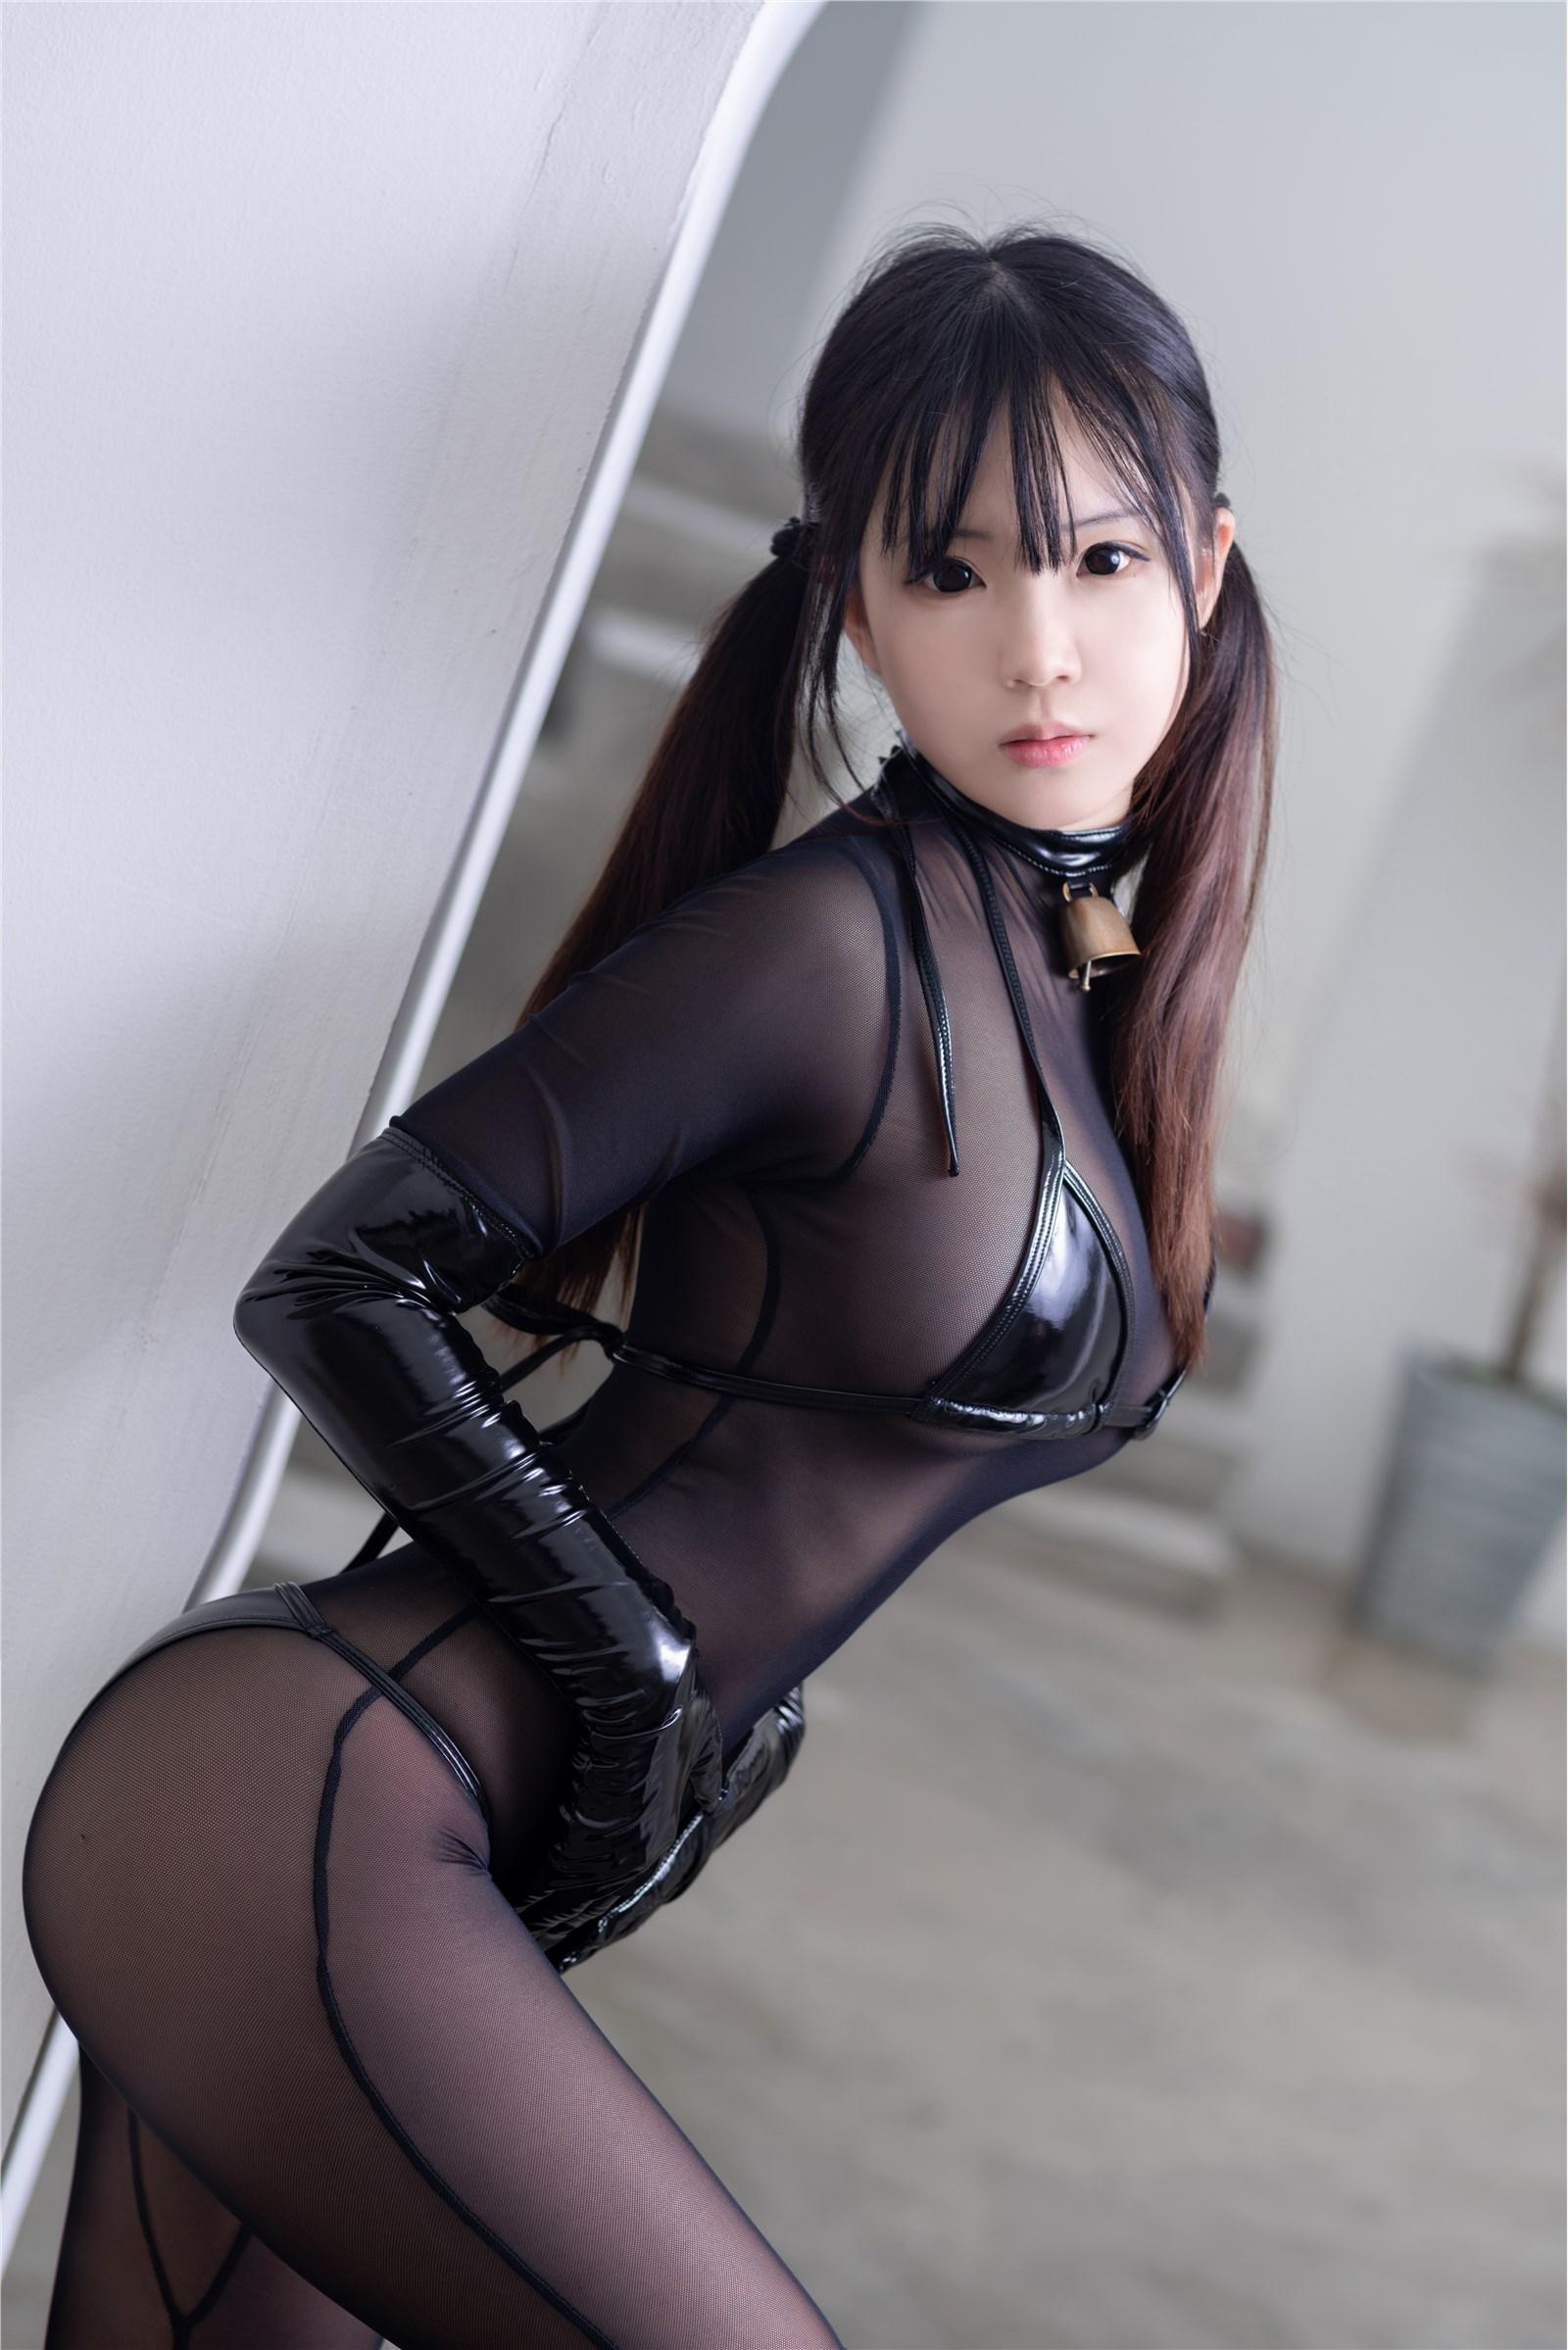 御子Yumiko-紧身衣漆皮私房